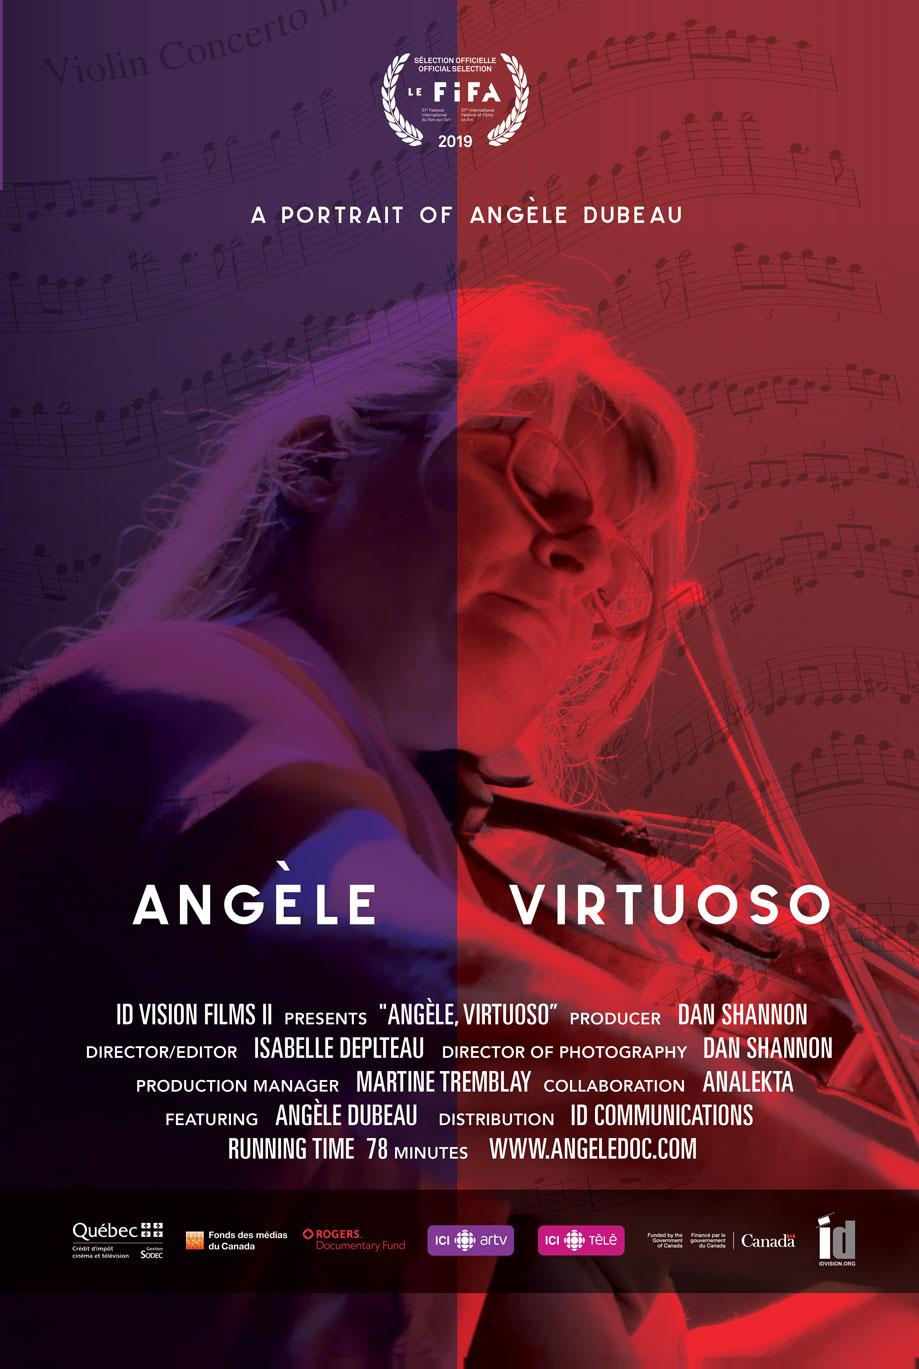 Angele virtuoso